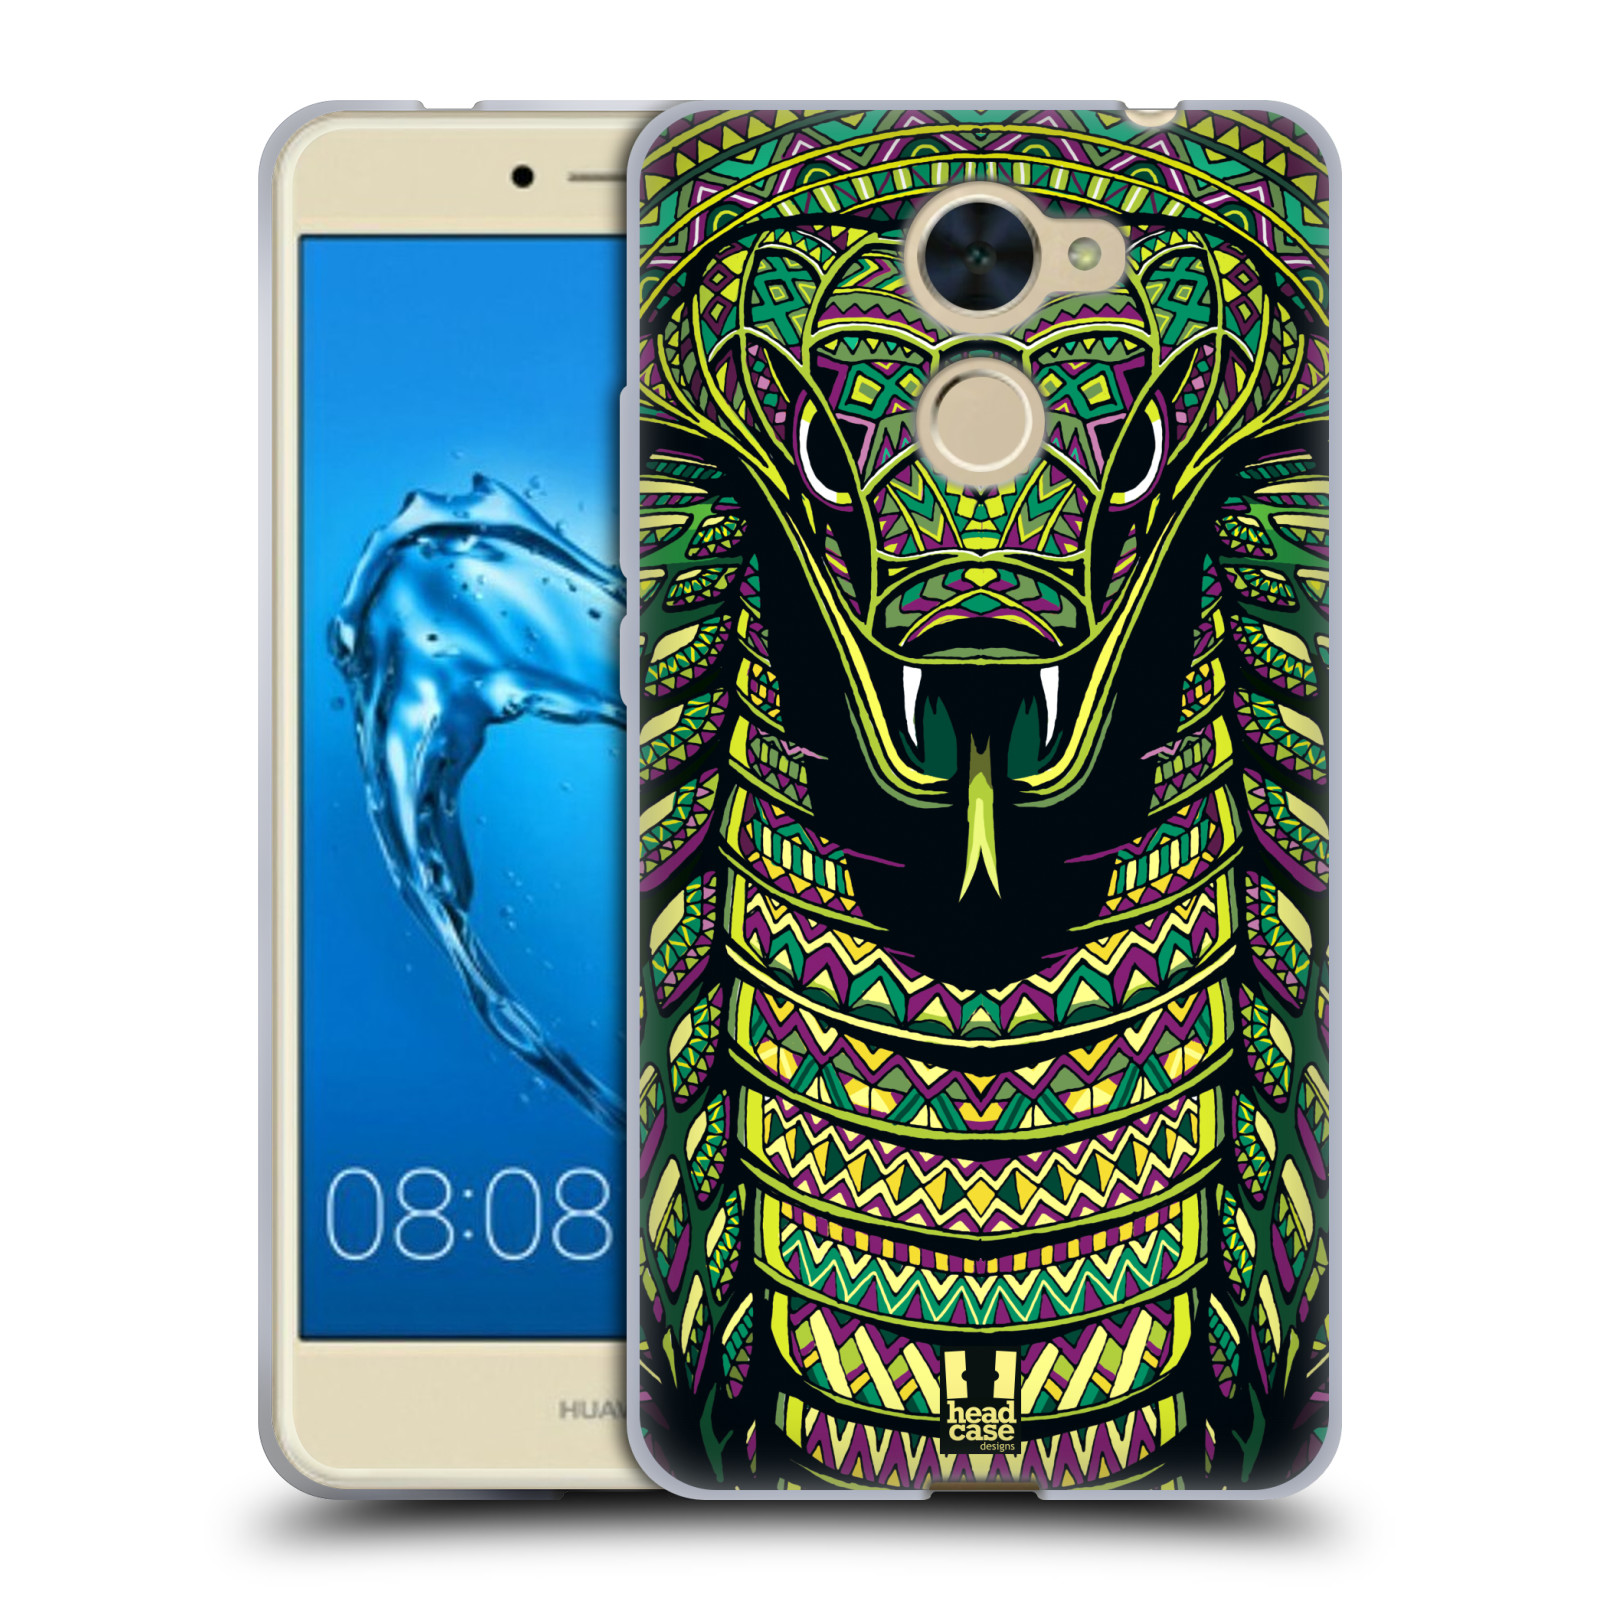 Silikonové pouzdro na mobil Huawei Y7 - Head Case - AZTEC HAD